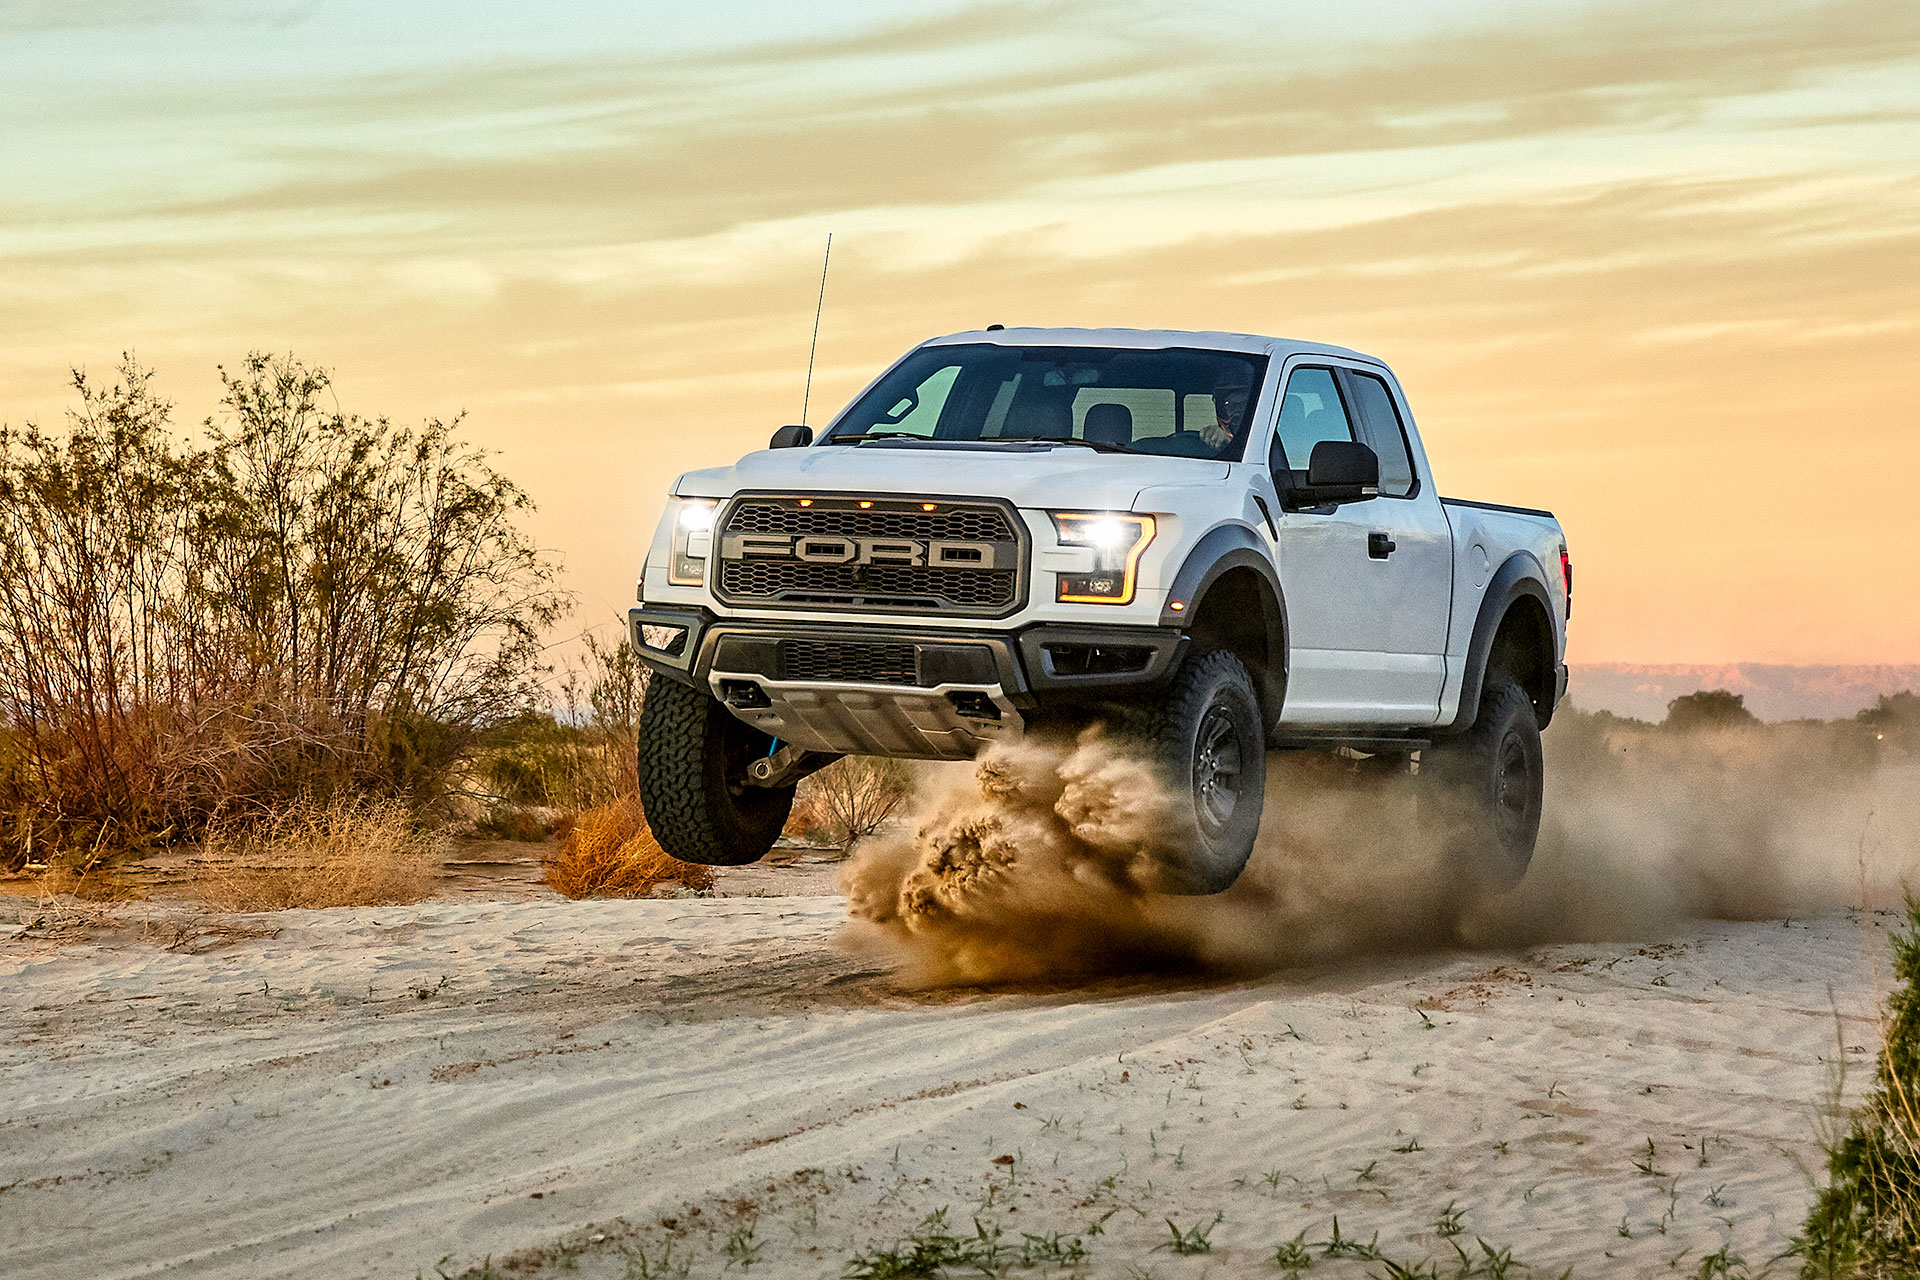 austin-trigg-southern-california-White-raptor-ford-truck-jump-desert-anza-borrego-sunset-dust-driving.jpg